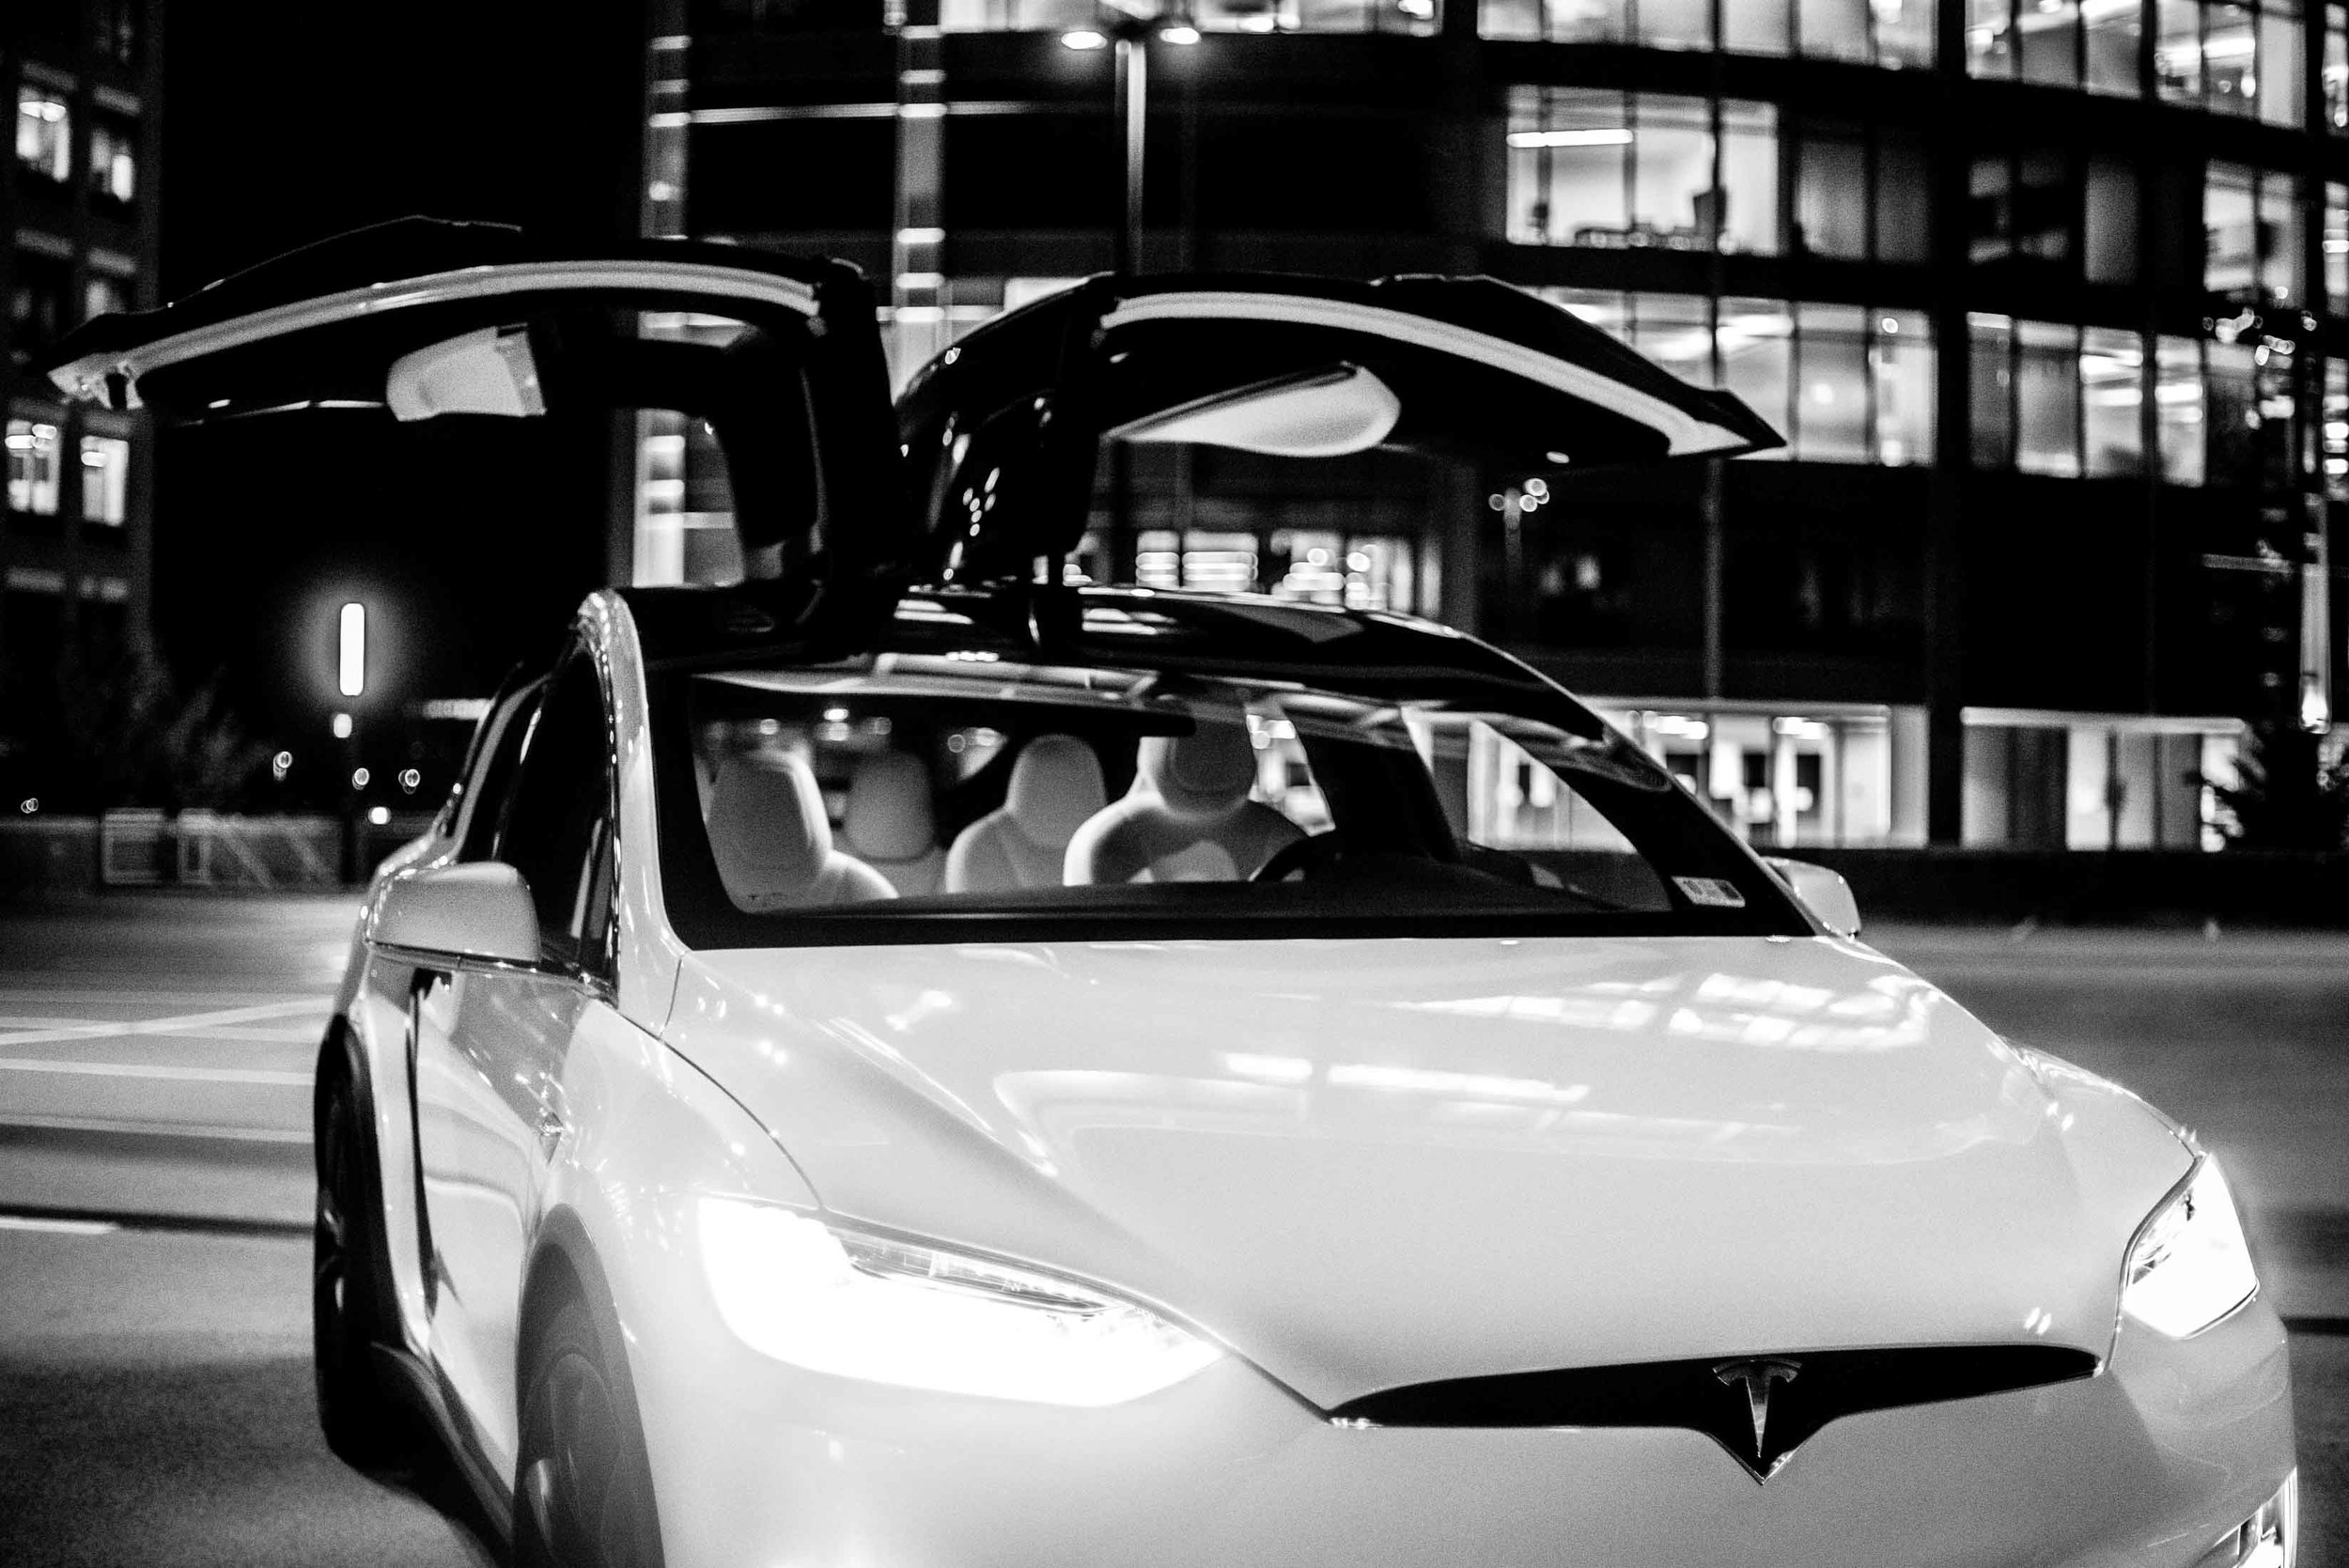 fleet+vehicle+sexy+car+photo+video+speed+tesla+p100d+vadym+guliuk+photography-7.jpg